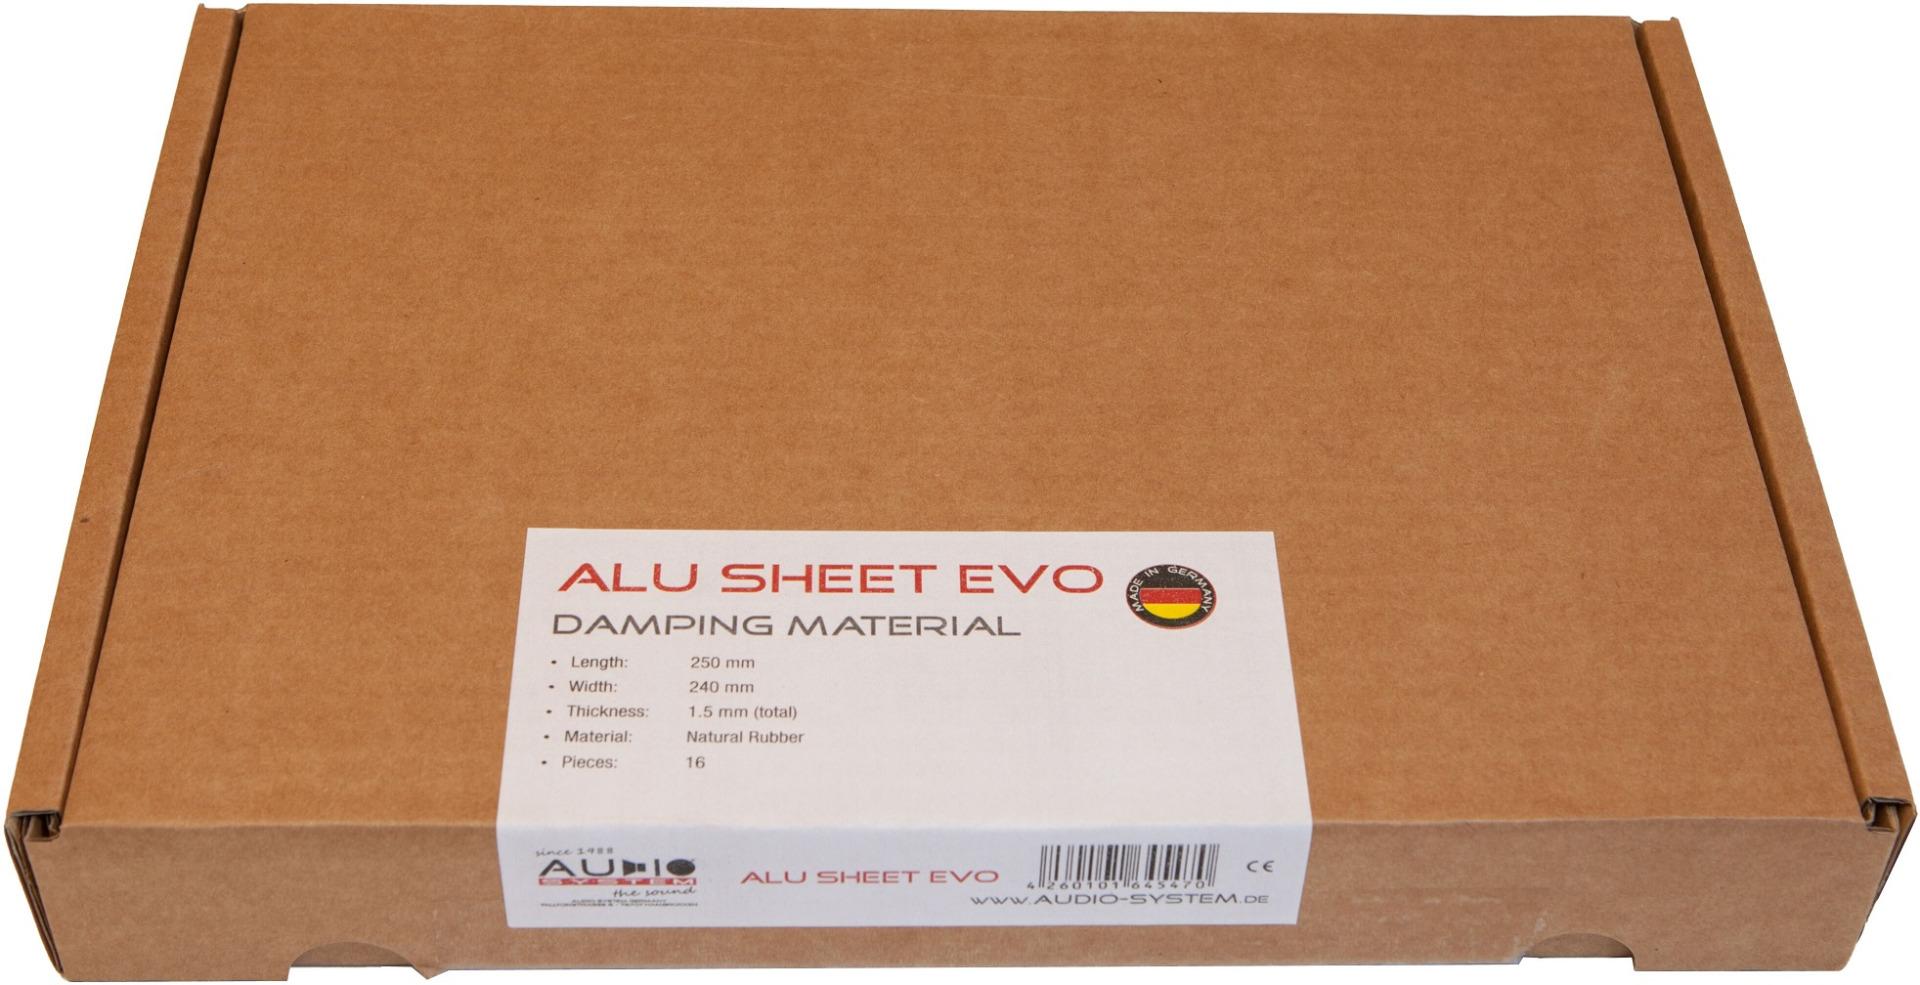 Audio System  ALU SHEET EVO 16 Stück 25cm x 25 cm (0,96m²)